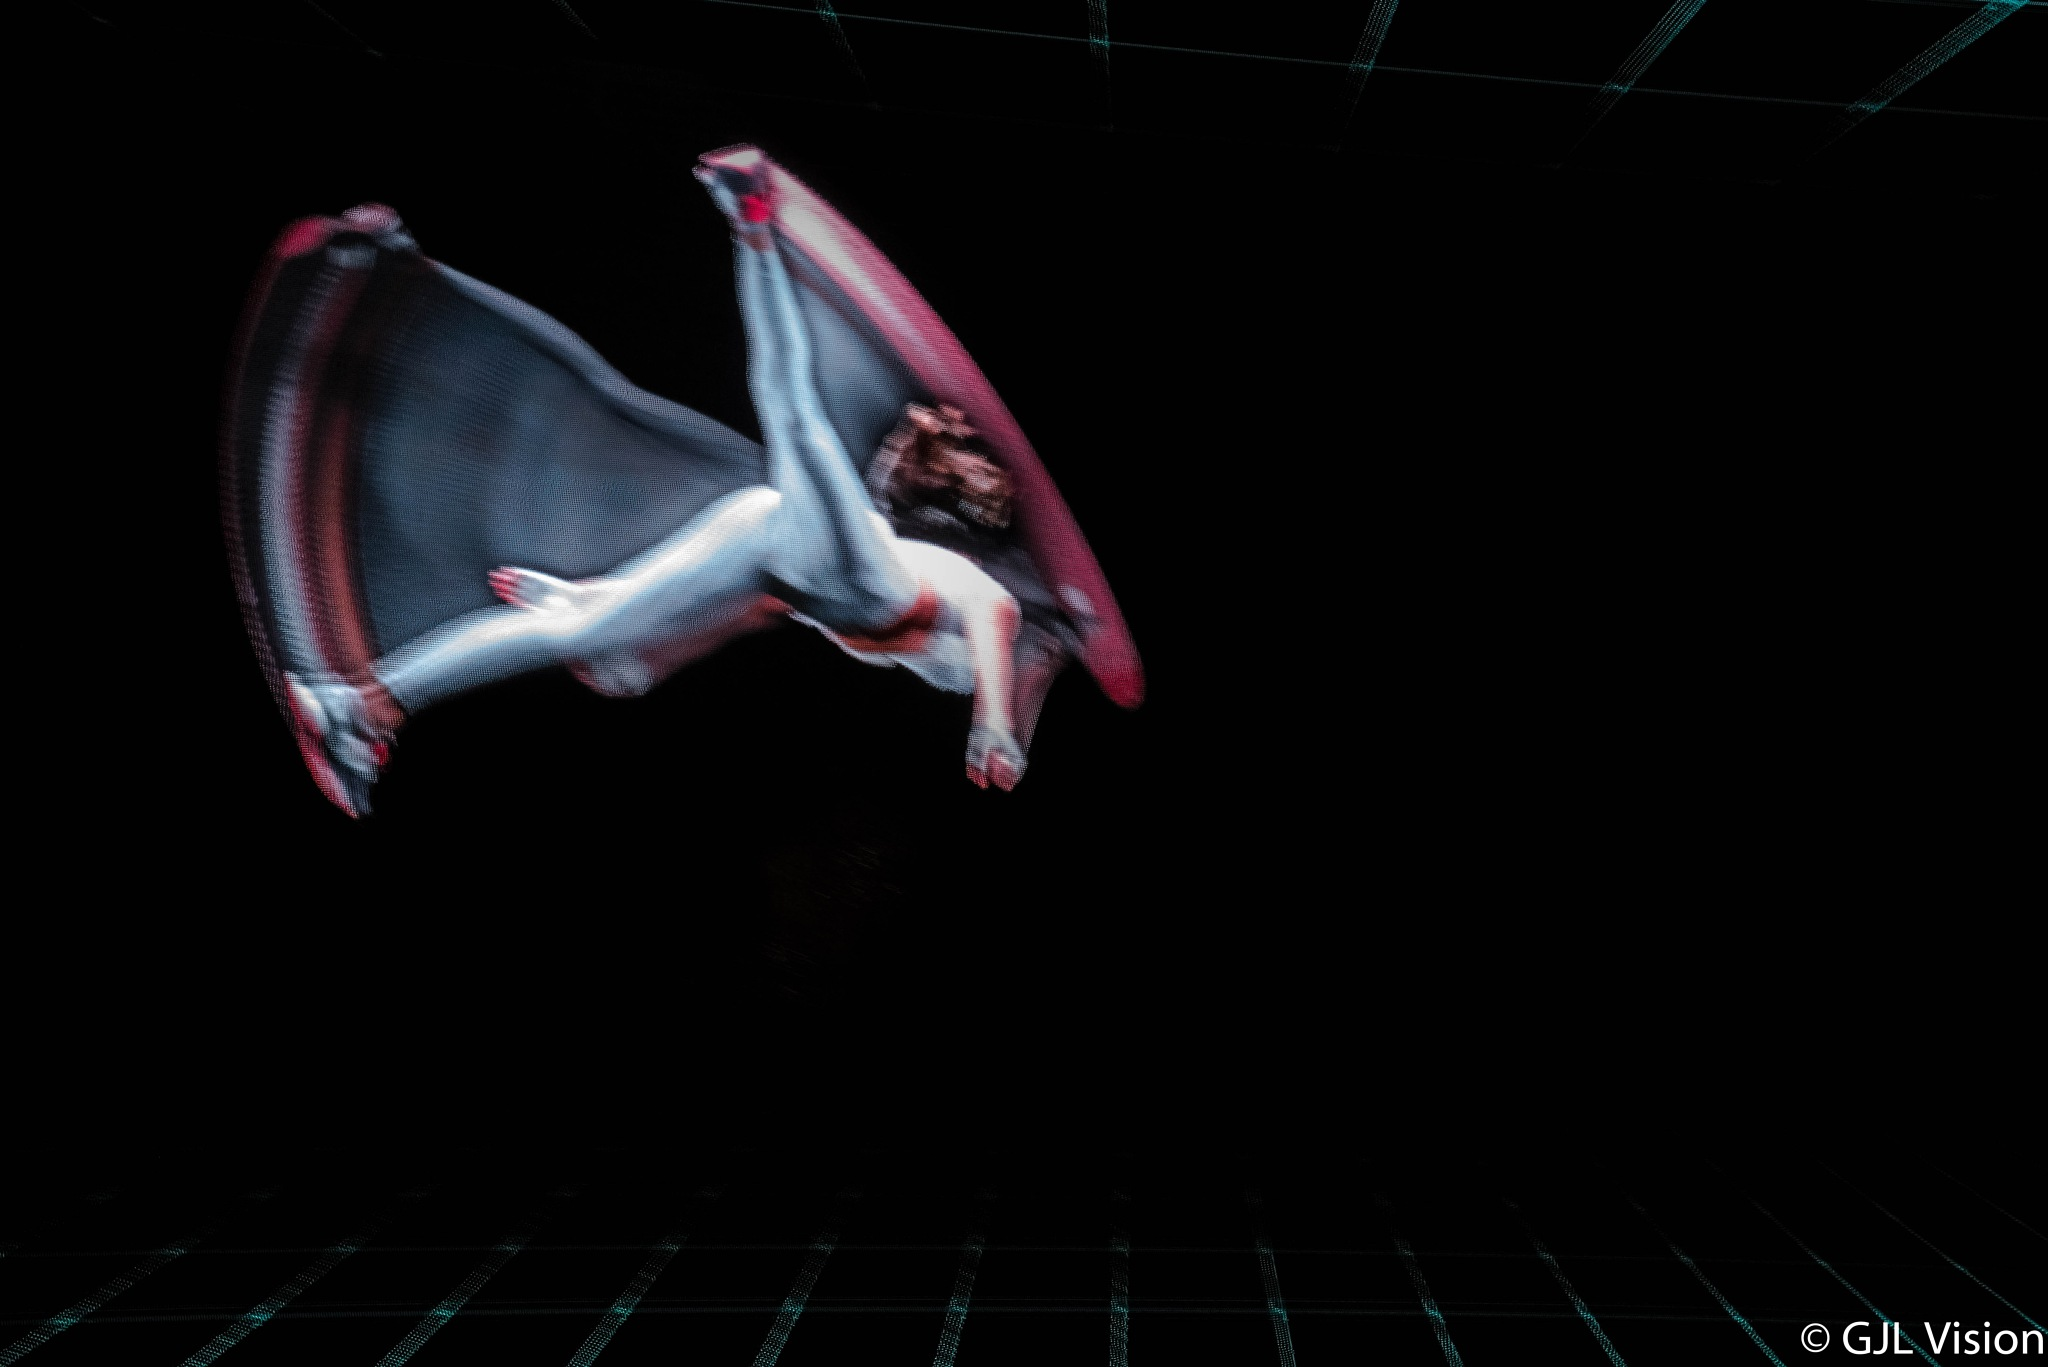 Holigram Dancer by gilbert.lopez.14